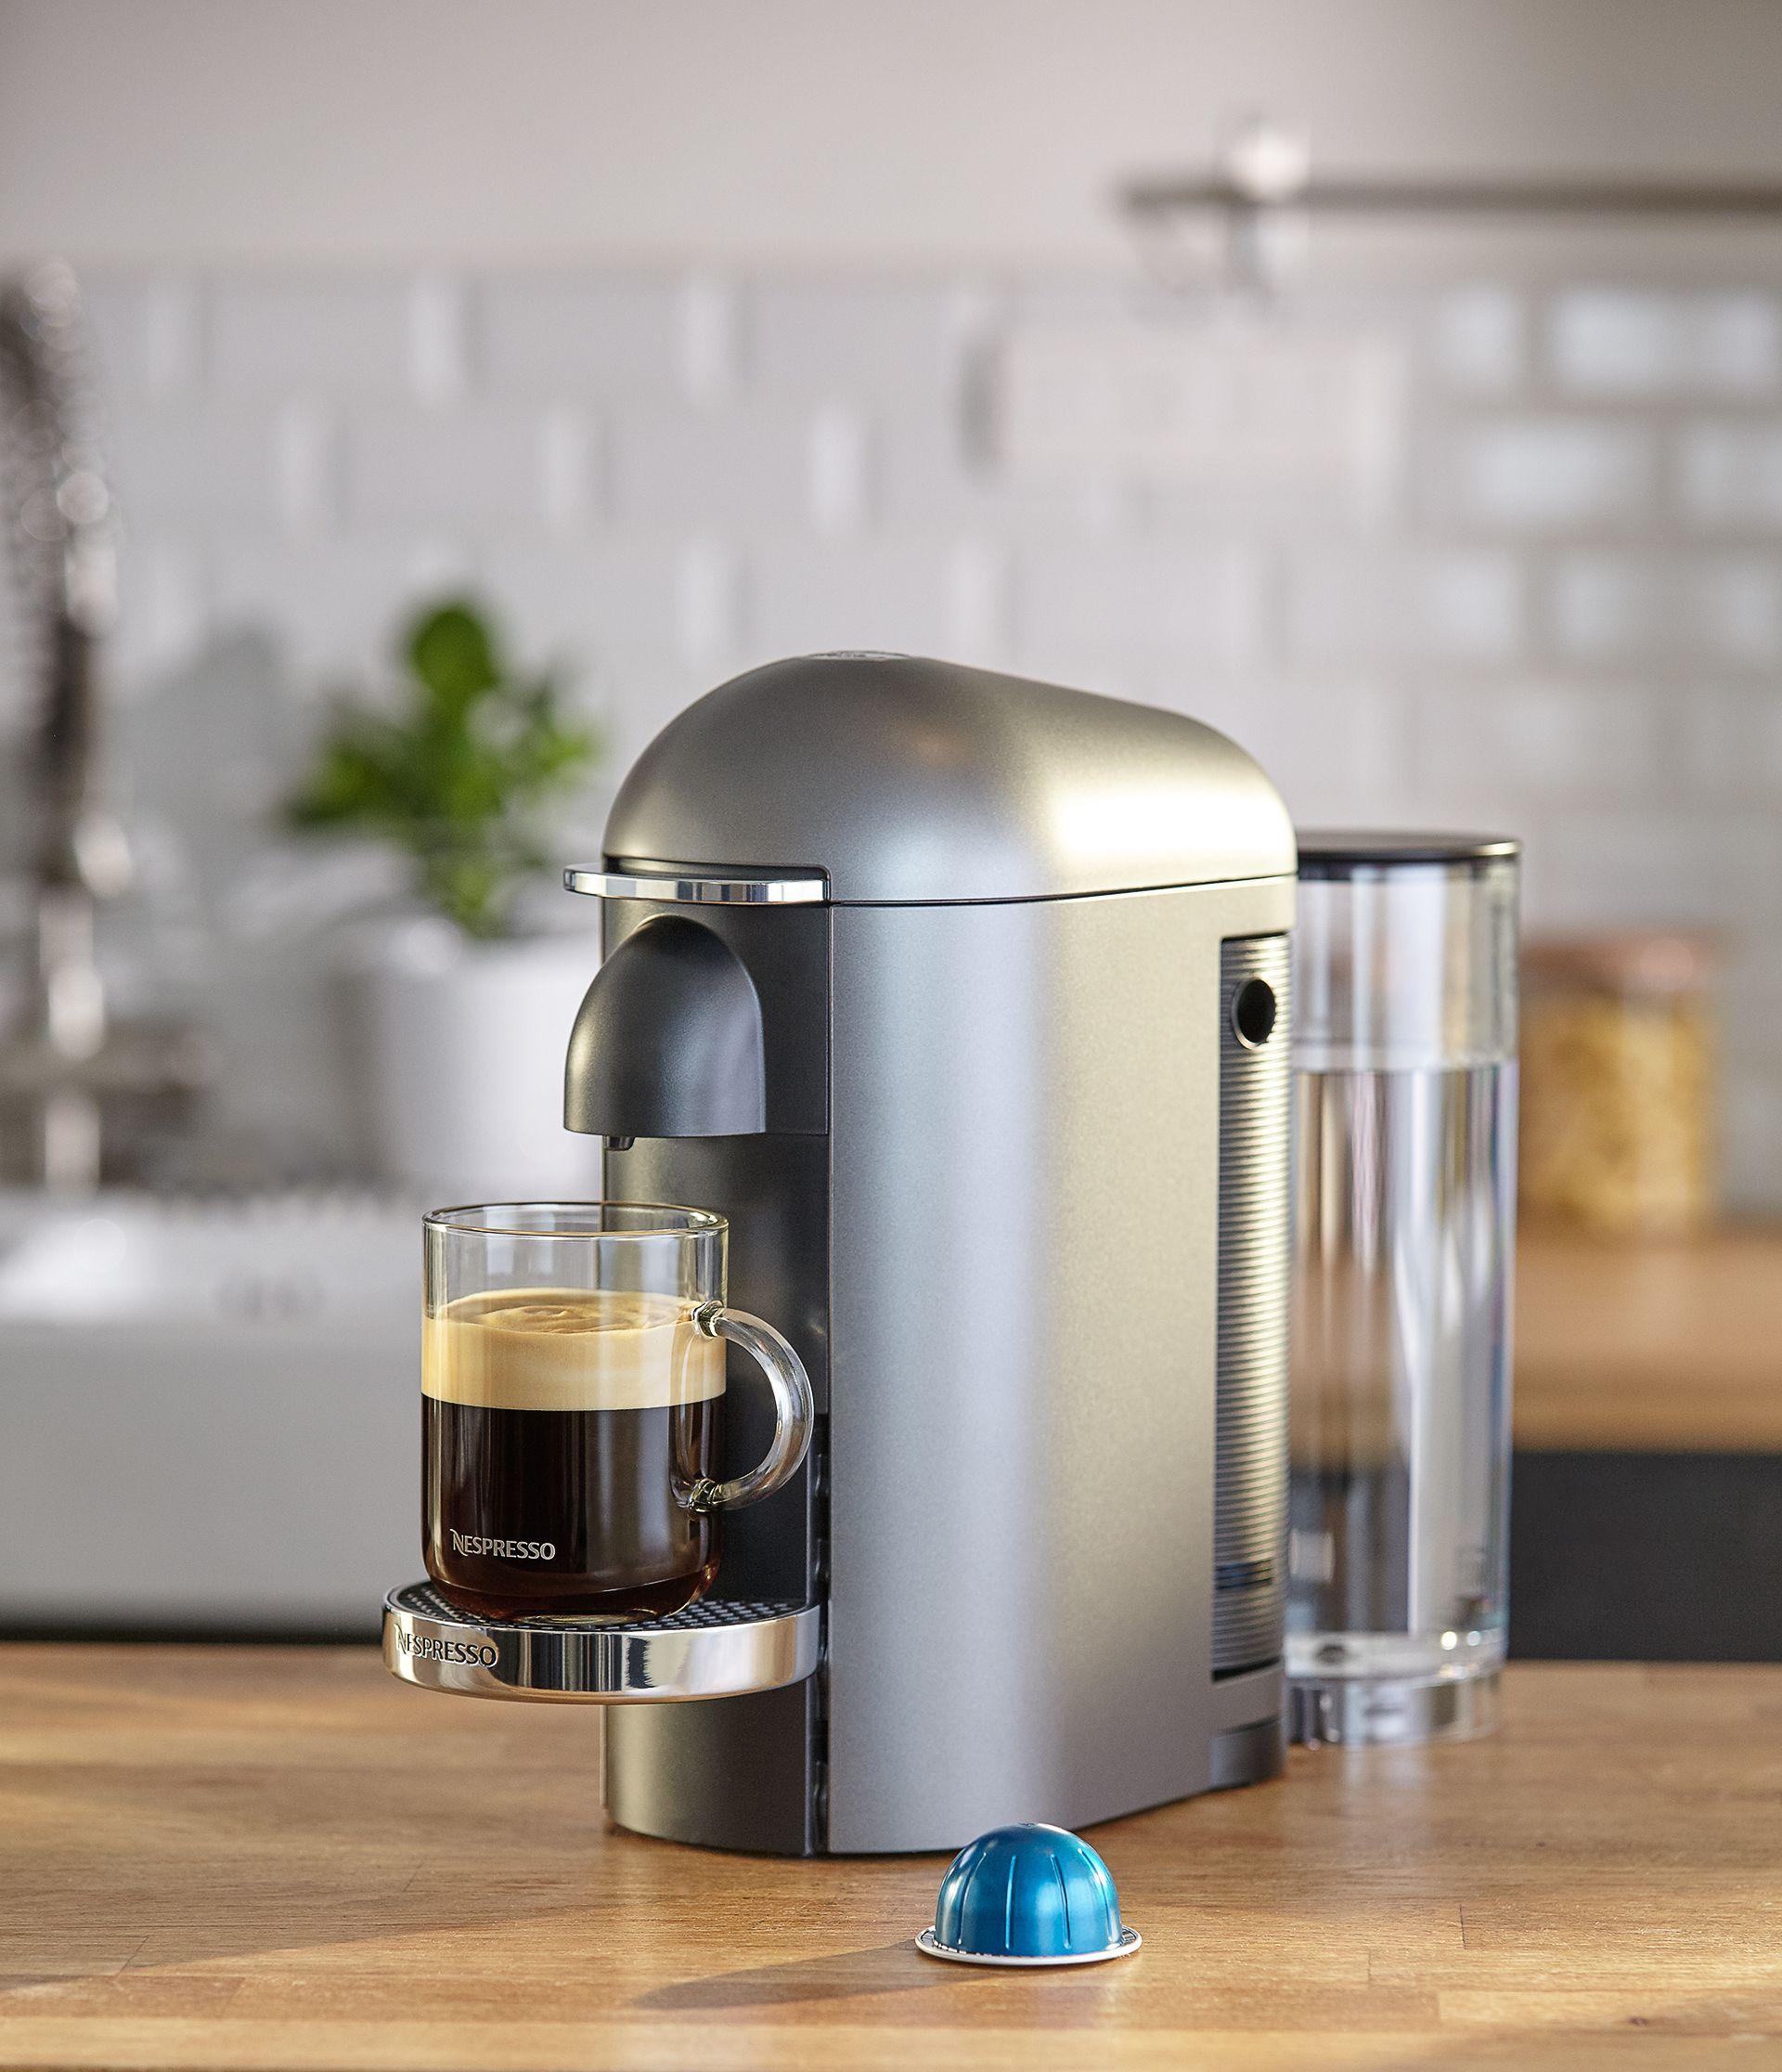 Exceptionnel Nouvelle Machine Nespresso #4: Nespresso Présente Sa Nouvelle Machine à Café : Vertuo